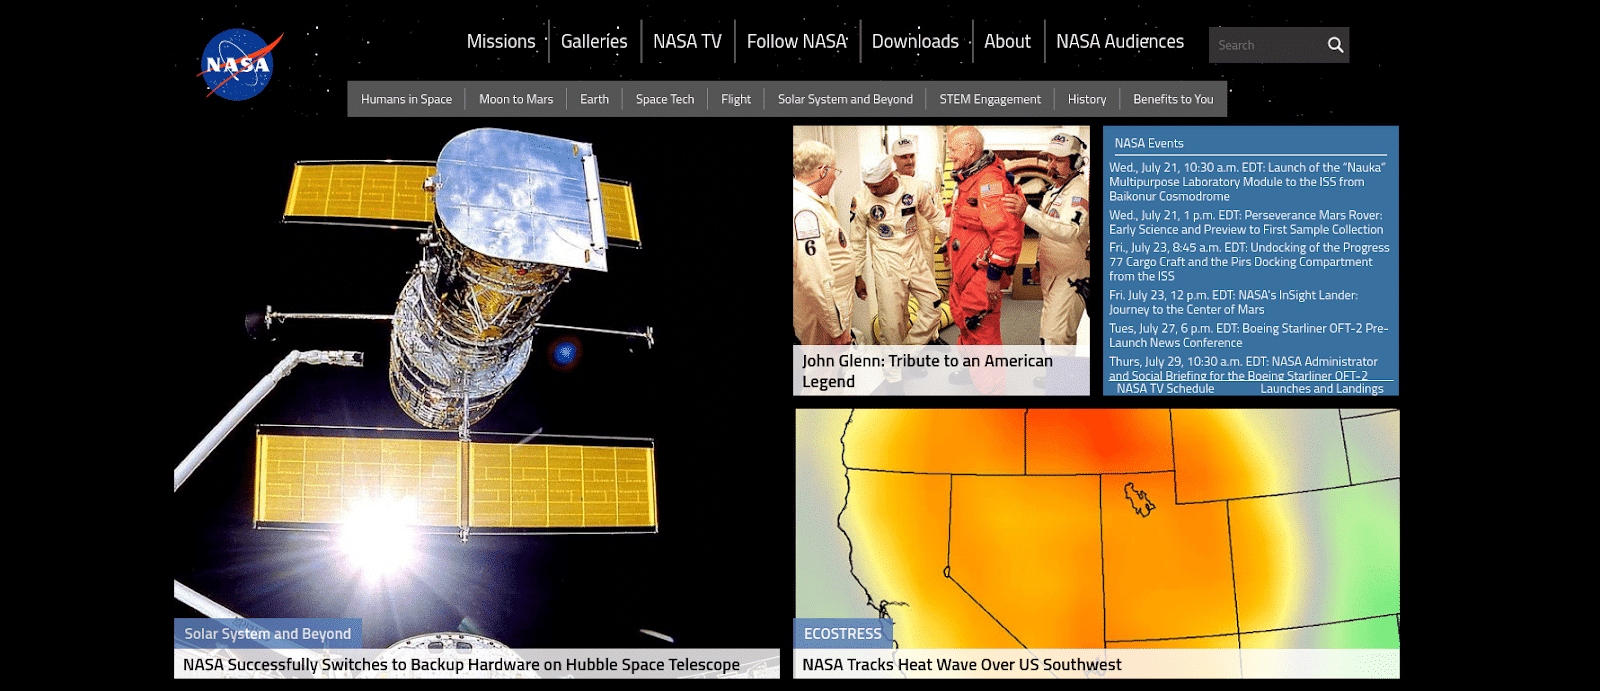 NASA's homepage screenshot.